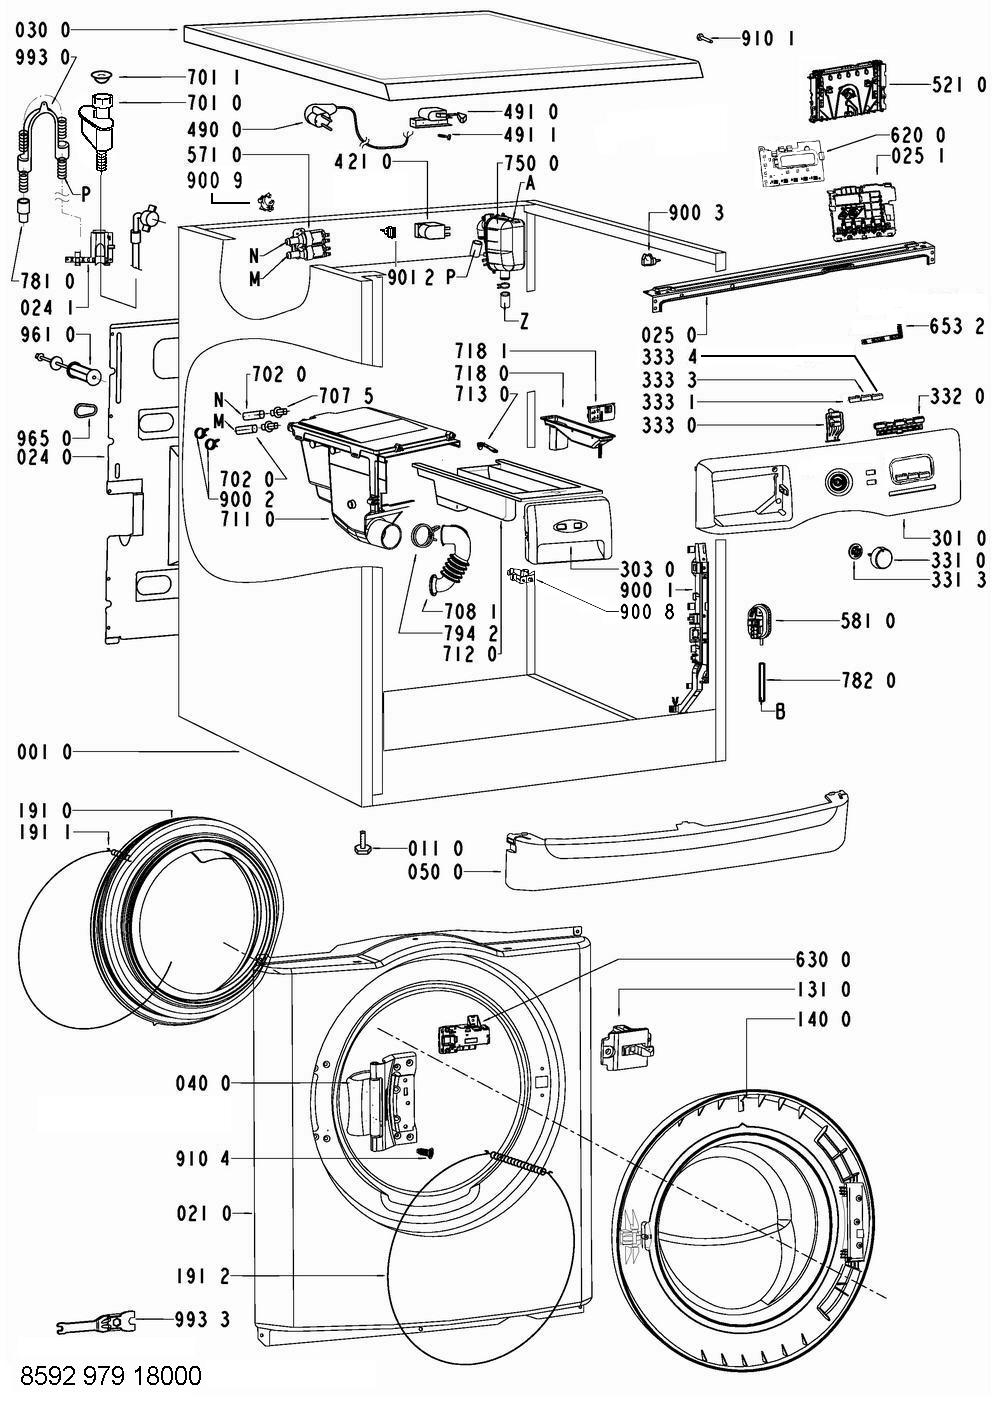 Awoe9558 859297918000 whirlpool lavadoras lavadoras - Recambios general electric ...